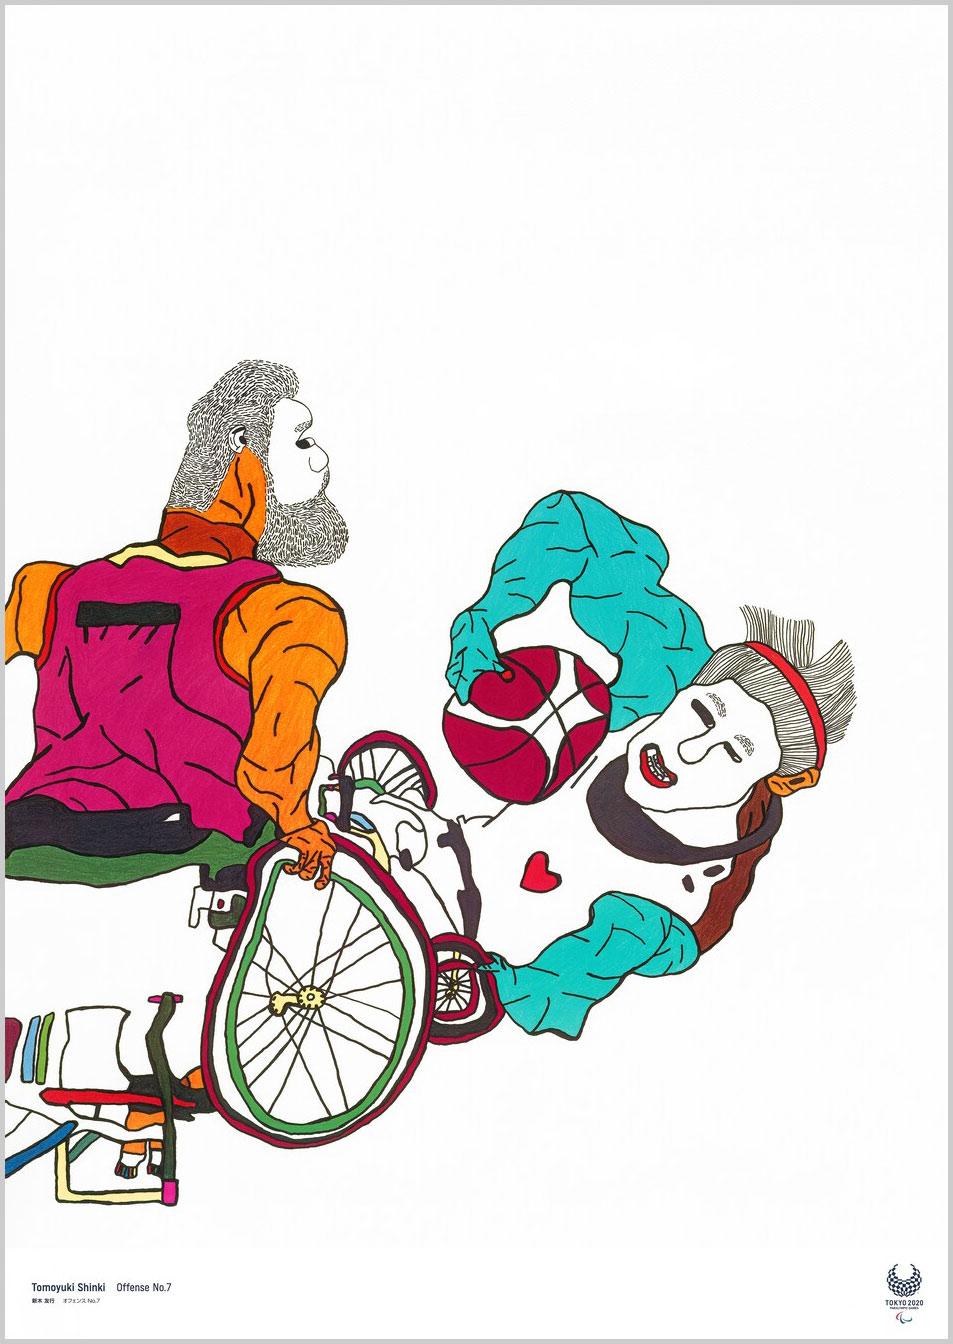 Tomoyuki Shinki (Artista) Cartazes oficiais para os Jogos Olímpicos Tóquio 2020